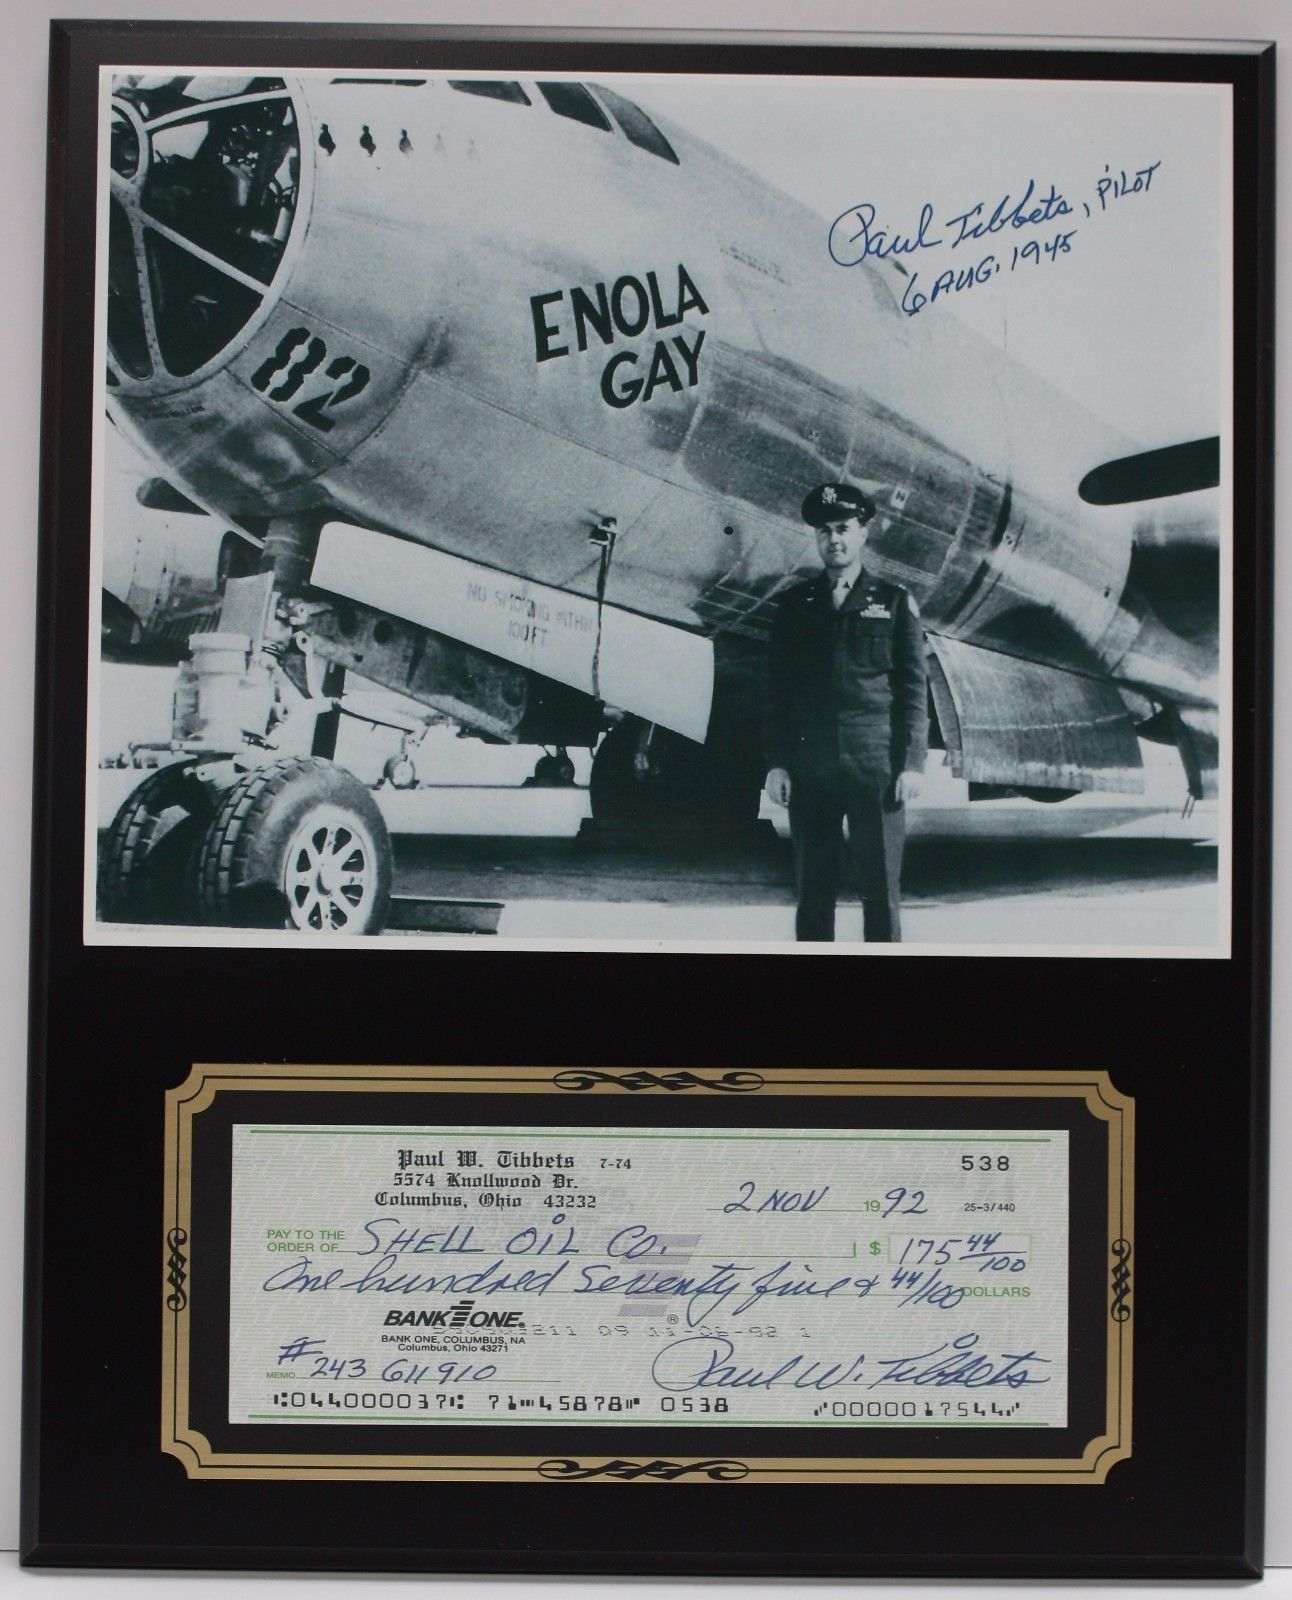 Paul Tibbets Enola Gay Reproduction Signed Limited Edition Check Display